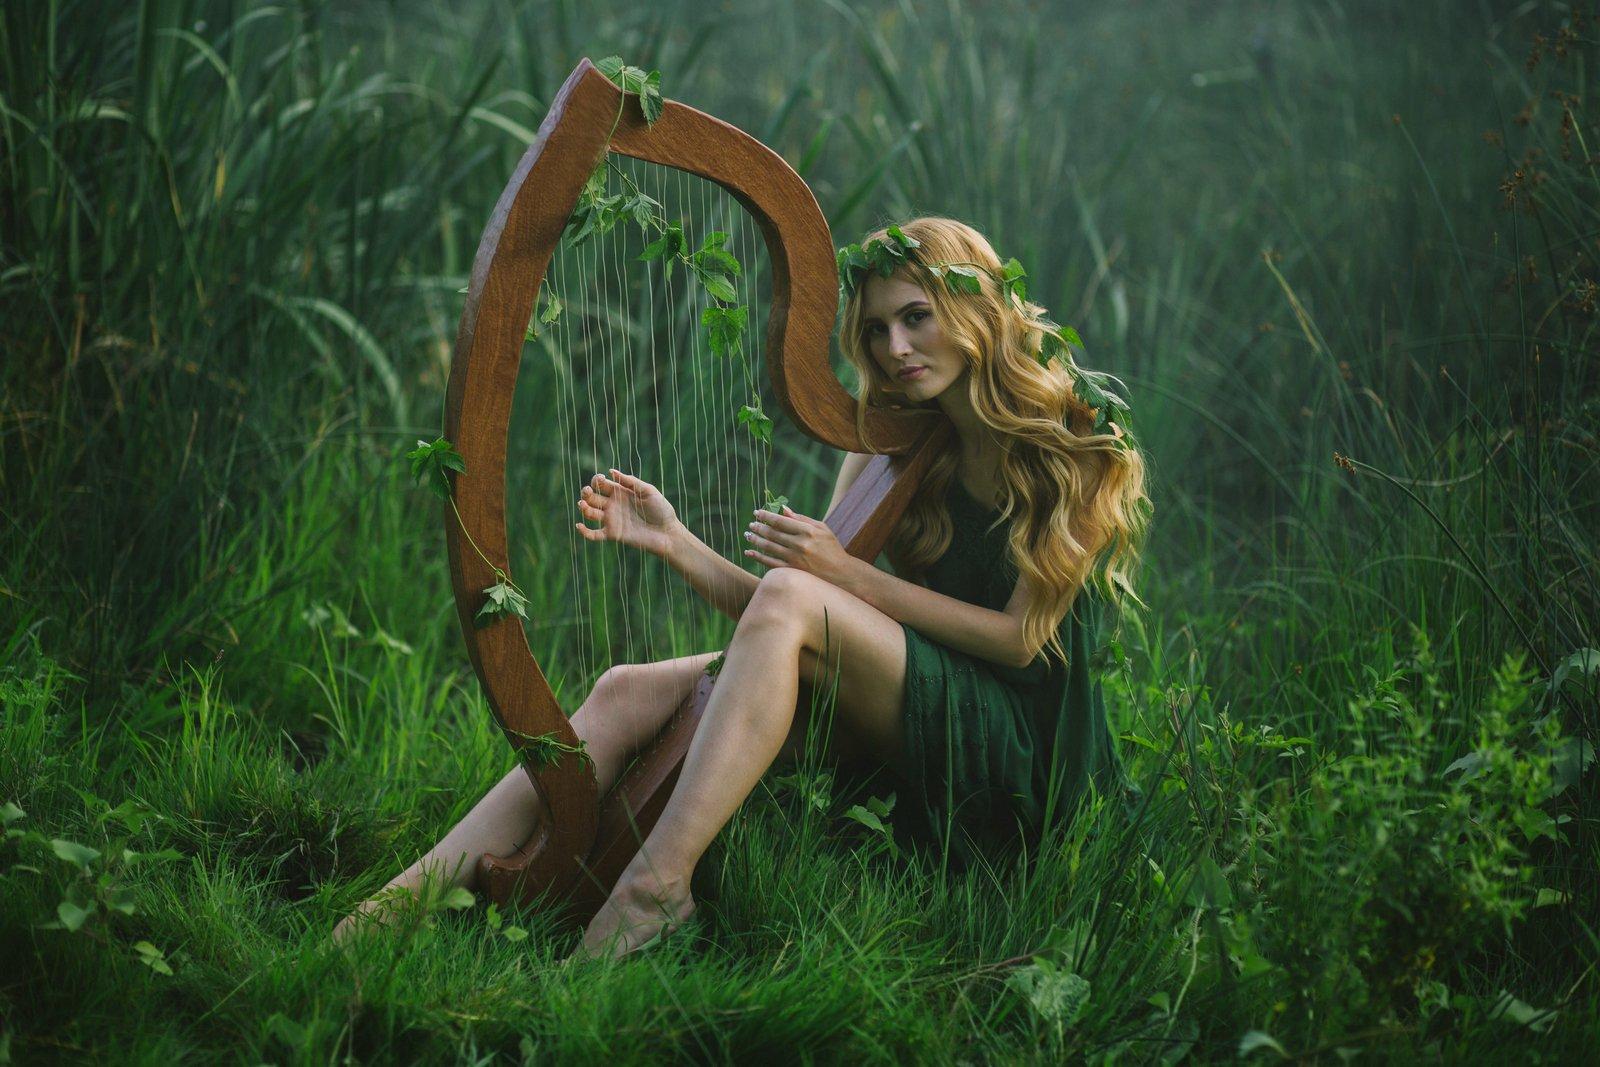 девушка, лес, природа, зелень, эльф, арфа, музыка, Биличенко Оксана